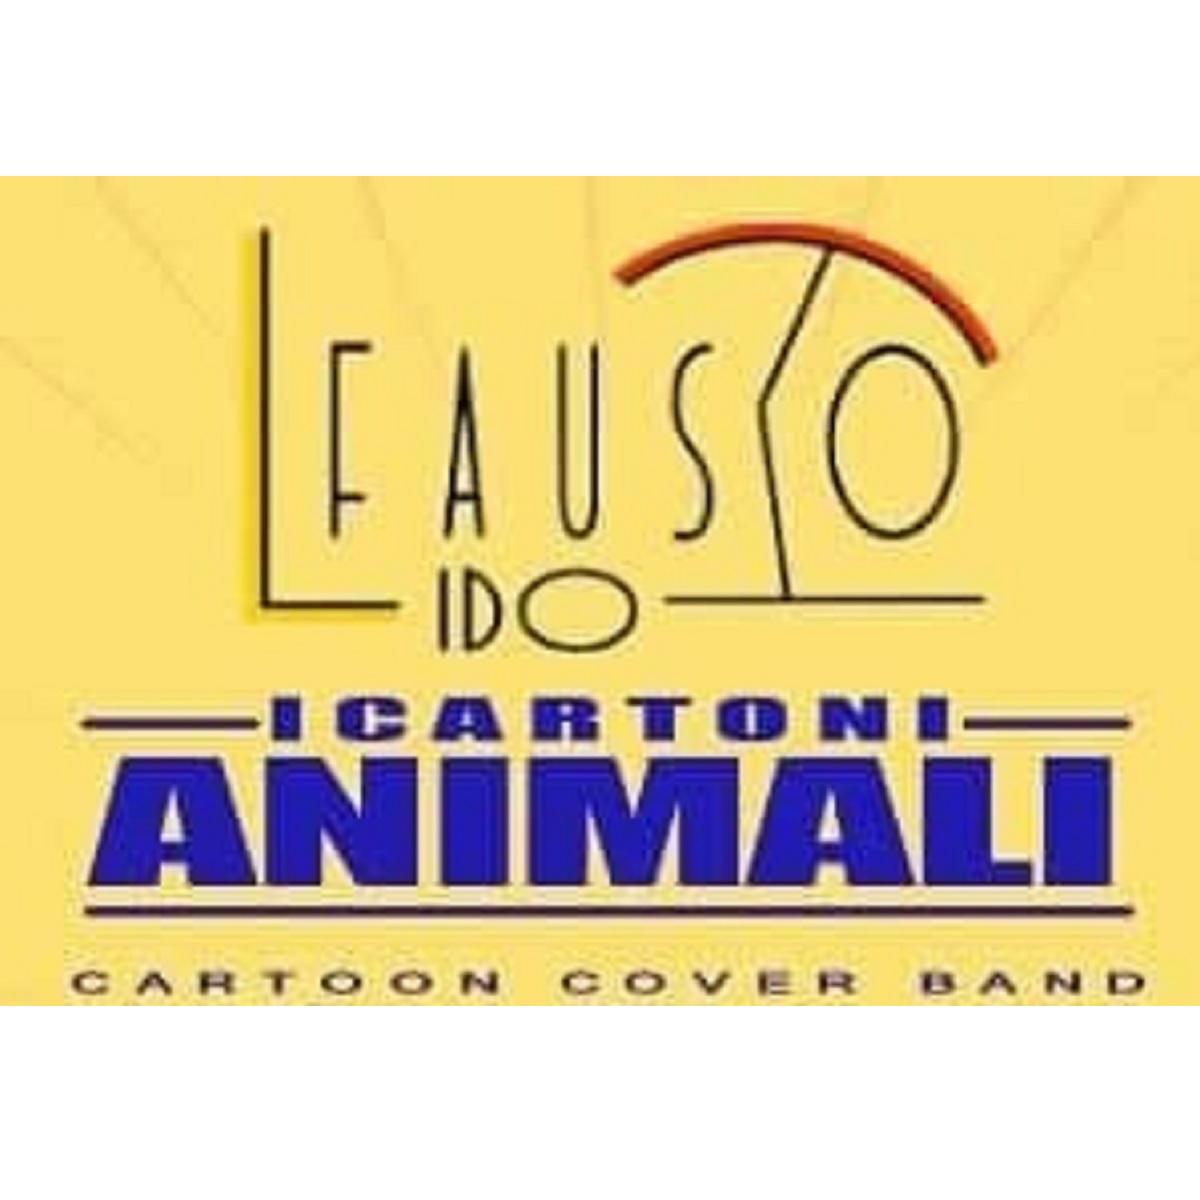 I Cartoni Animali live al Lido Fausto 31 luglio 2021 foto